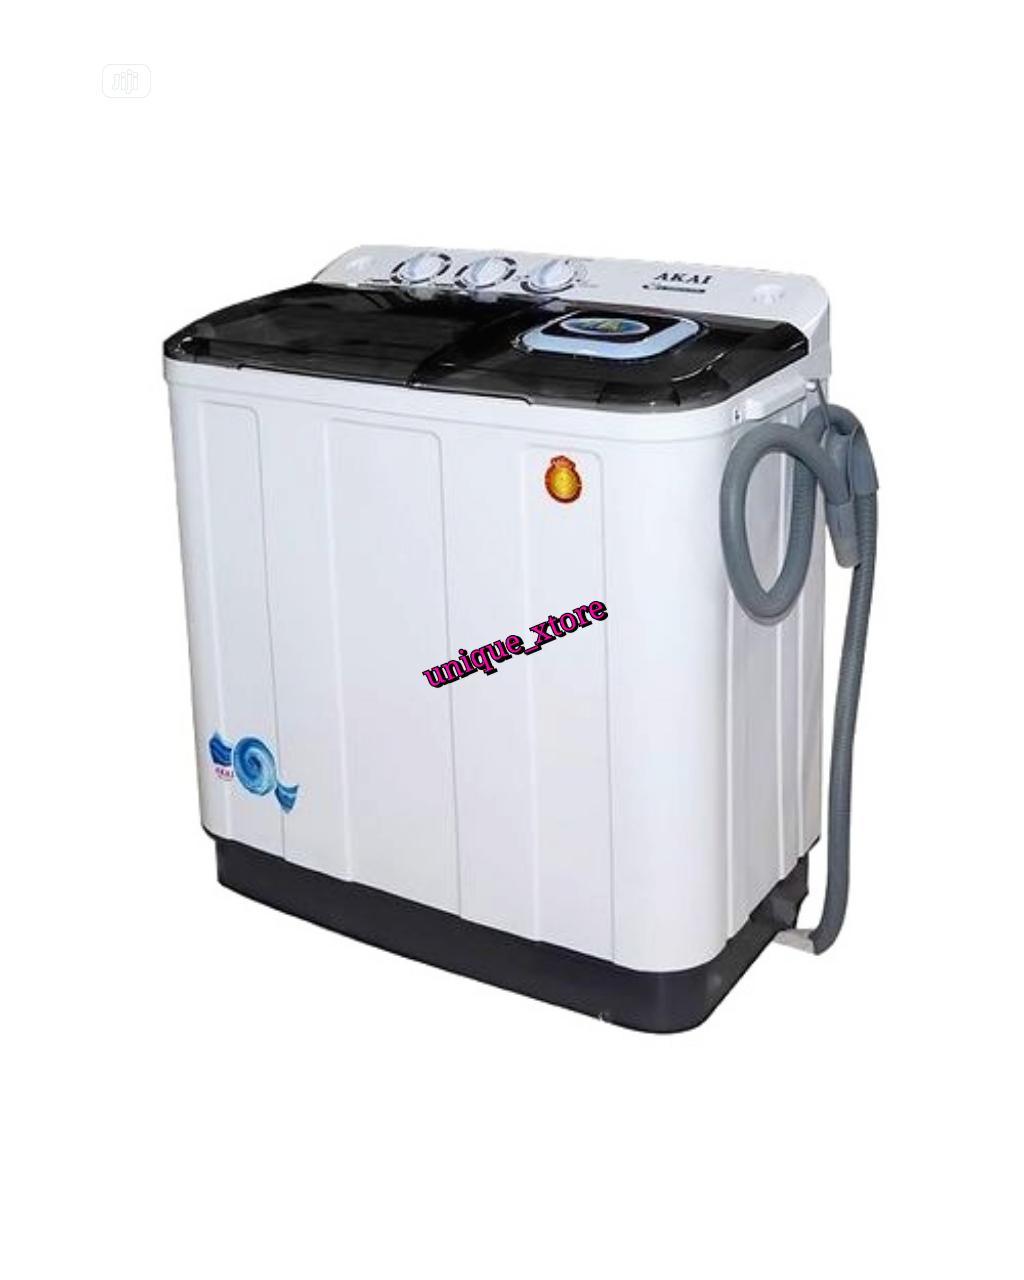 AKAI 7.0kg Twin Tub Washing Machine - SPINNING + DRAINING | Home Appliances for sale in Onitsha, Anambra State, Nigeria